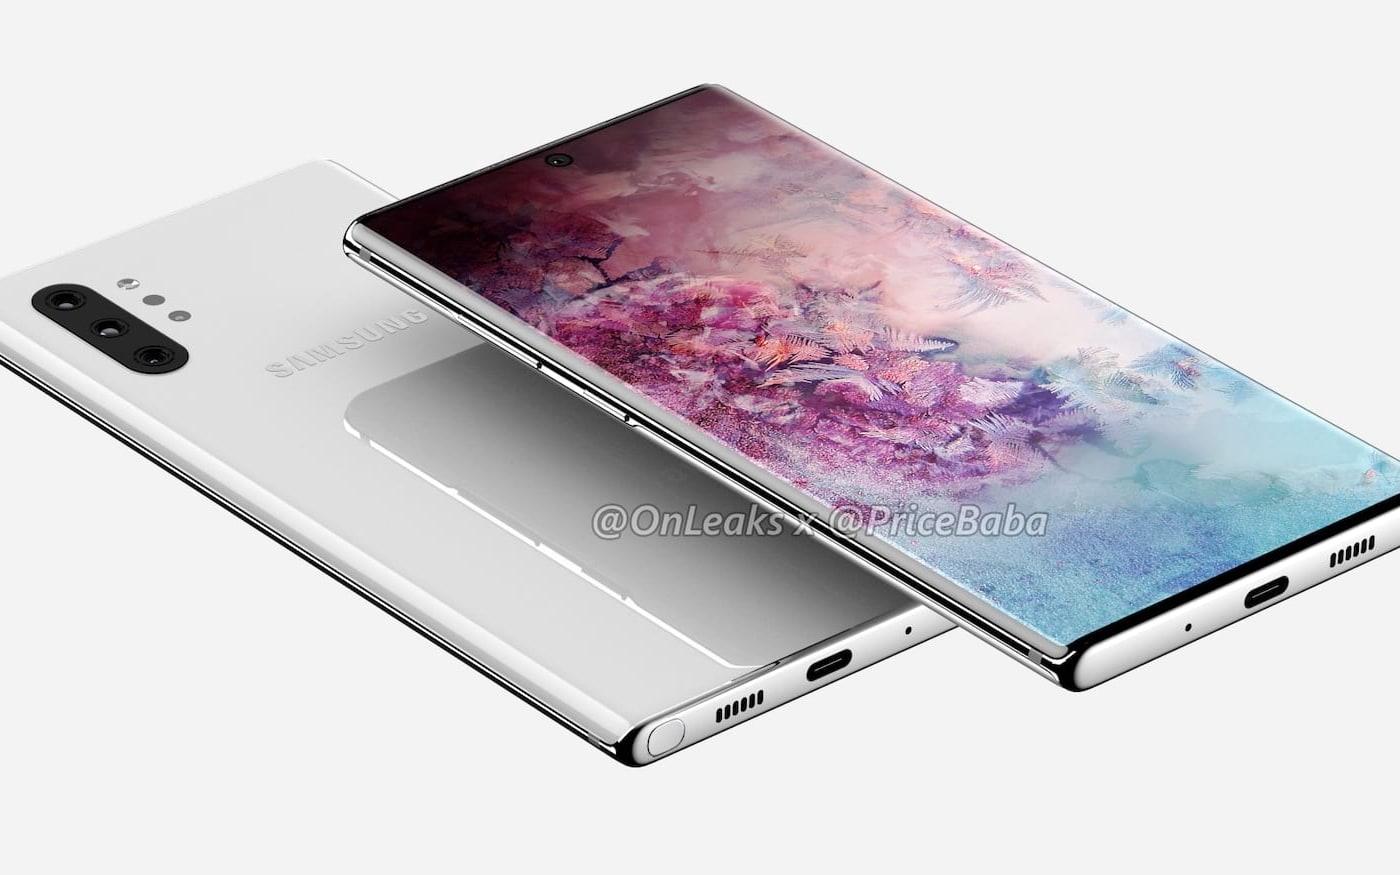 Galaxy Note10 e Note10+ devem custar a partir de R$4.300 e R$4.900